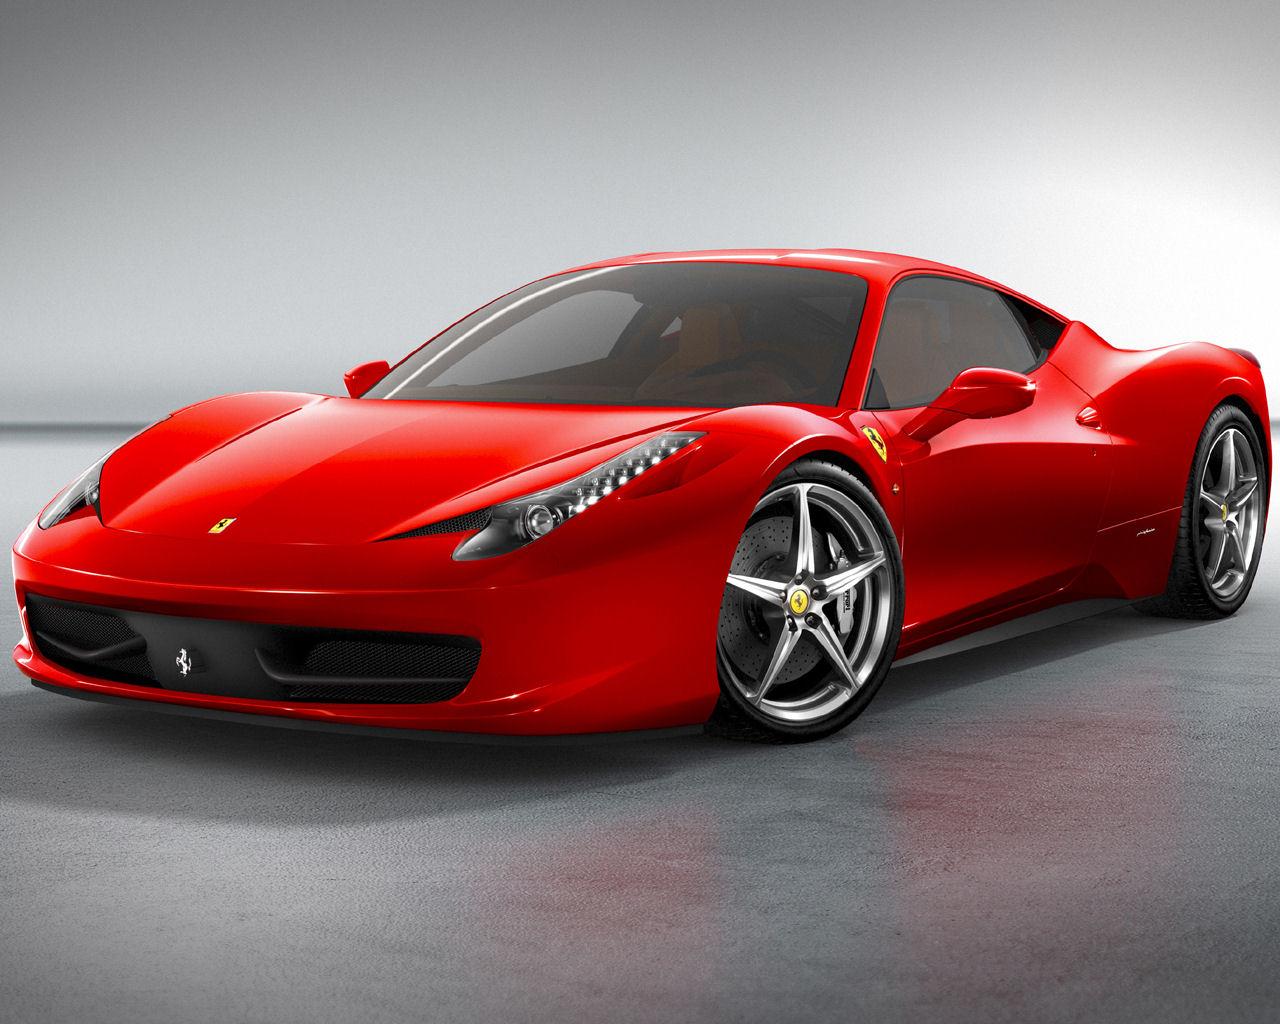 Ferrari 458 Italia V8 Free 1280x1024 Wallpaper Desktop